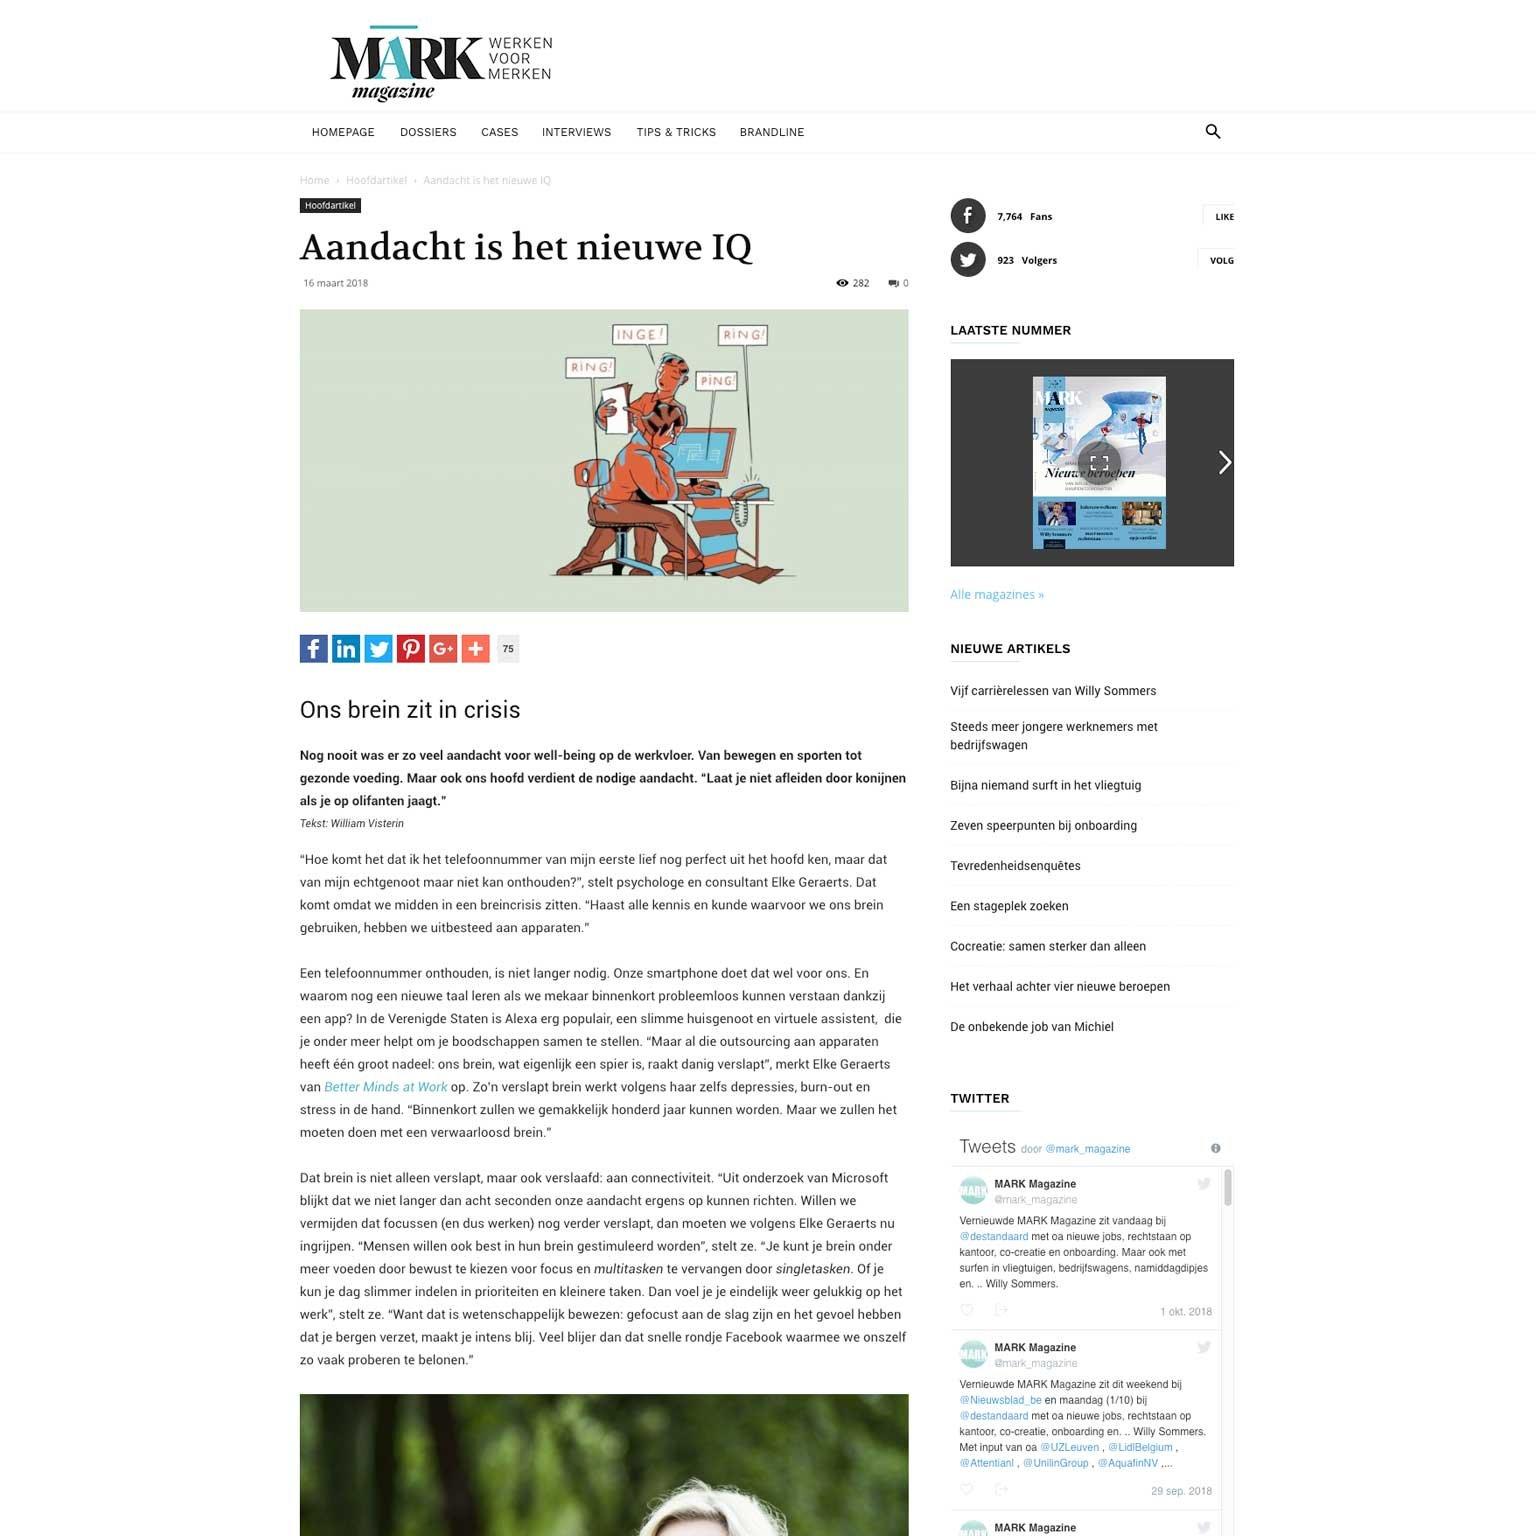 leadstreet-case-study-markmagazine-2